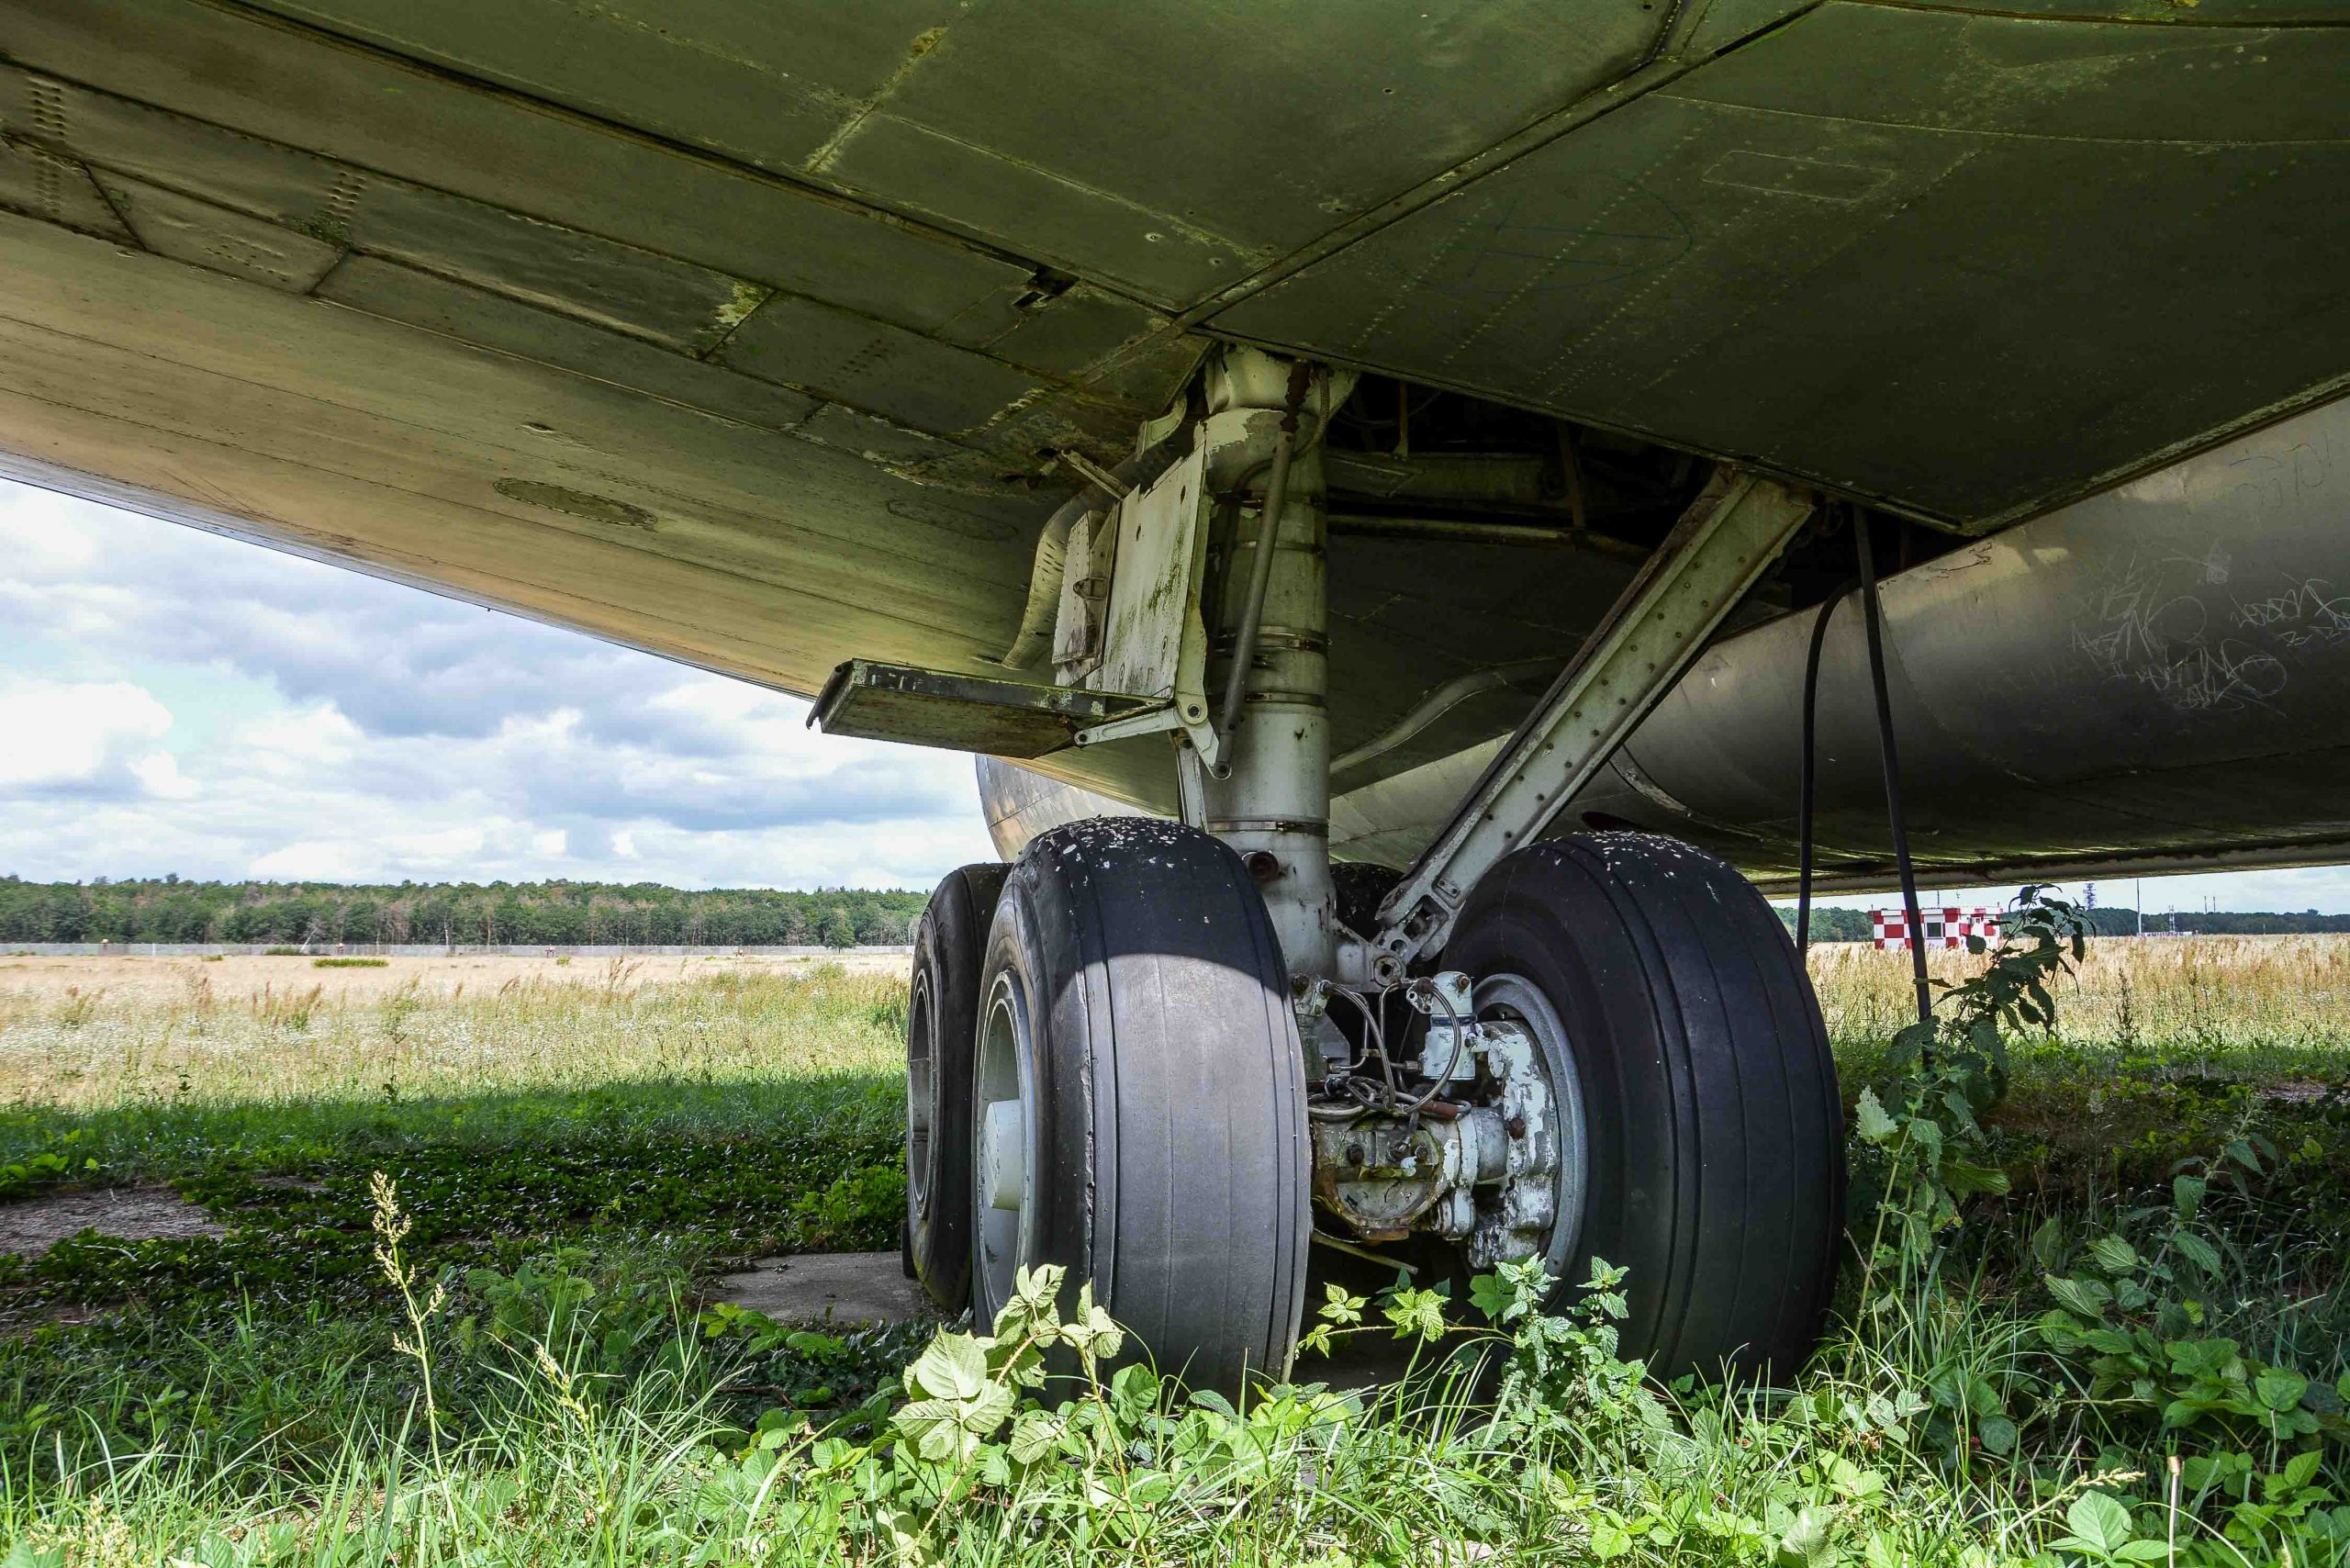 tire landing gear abandoned boeing 707 tegel txl flughafen airport berlin germany deutschland